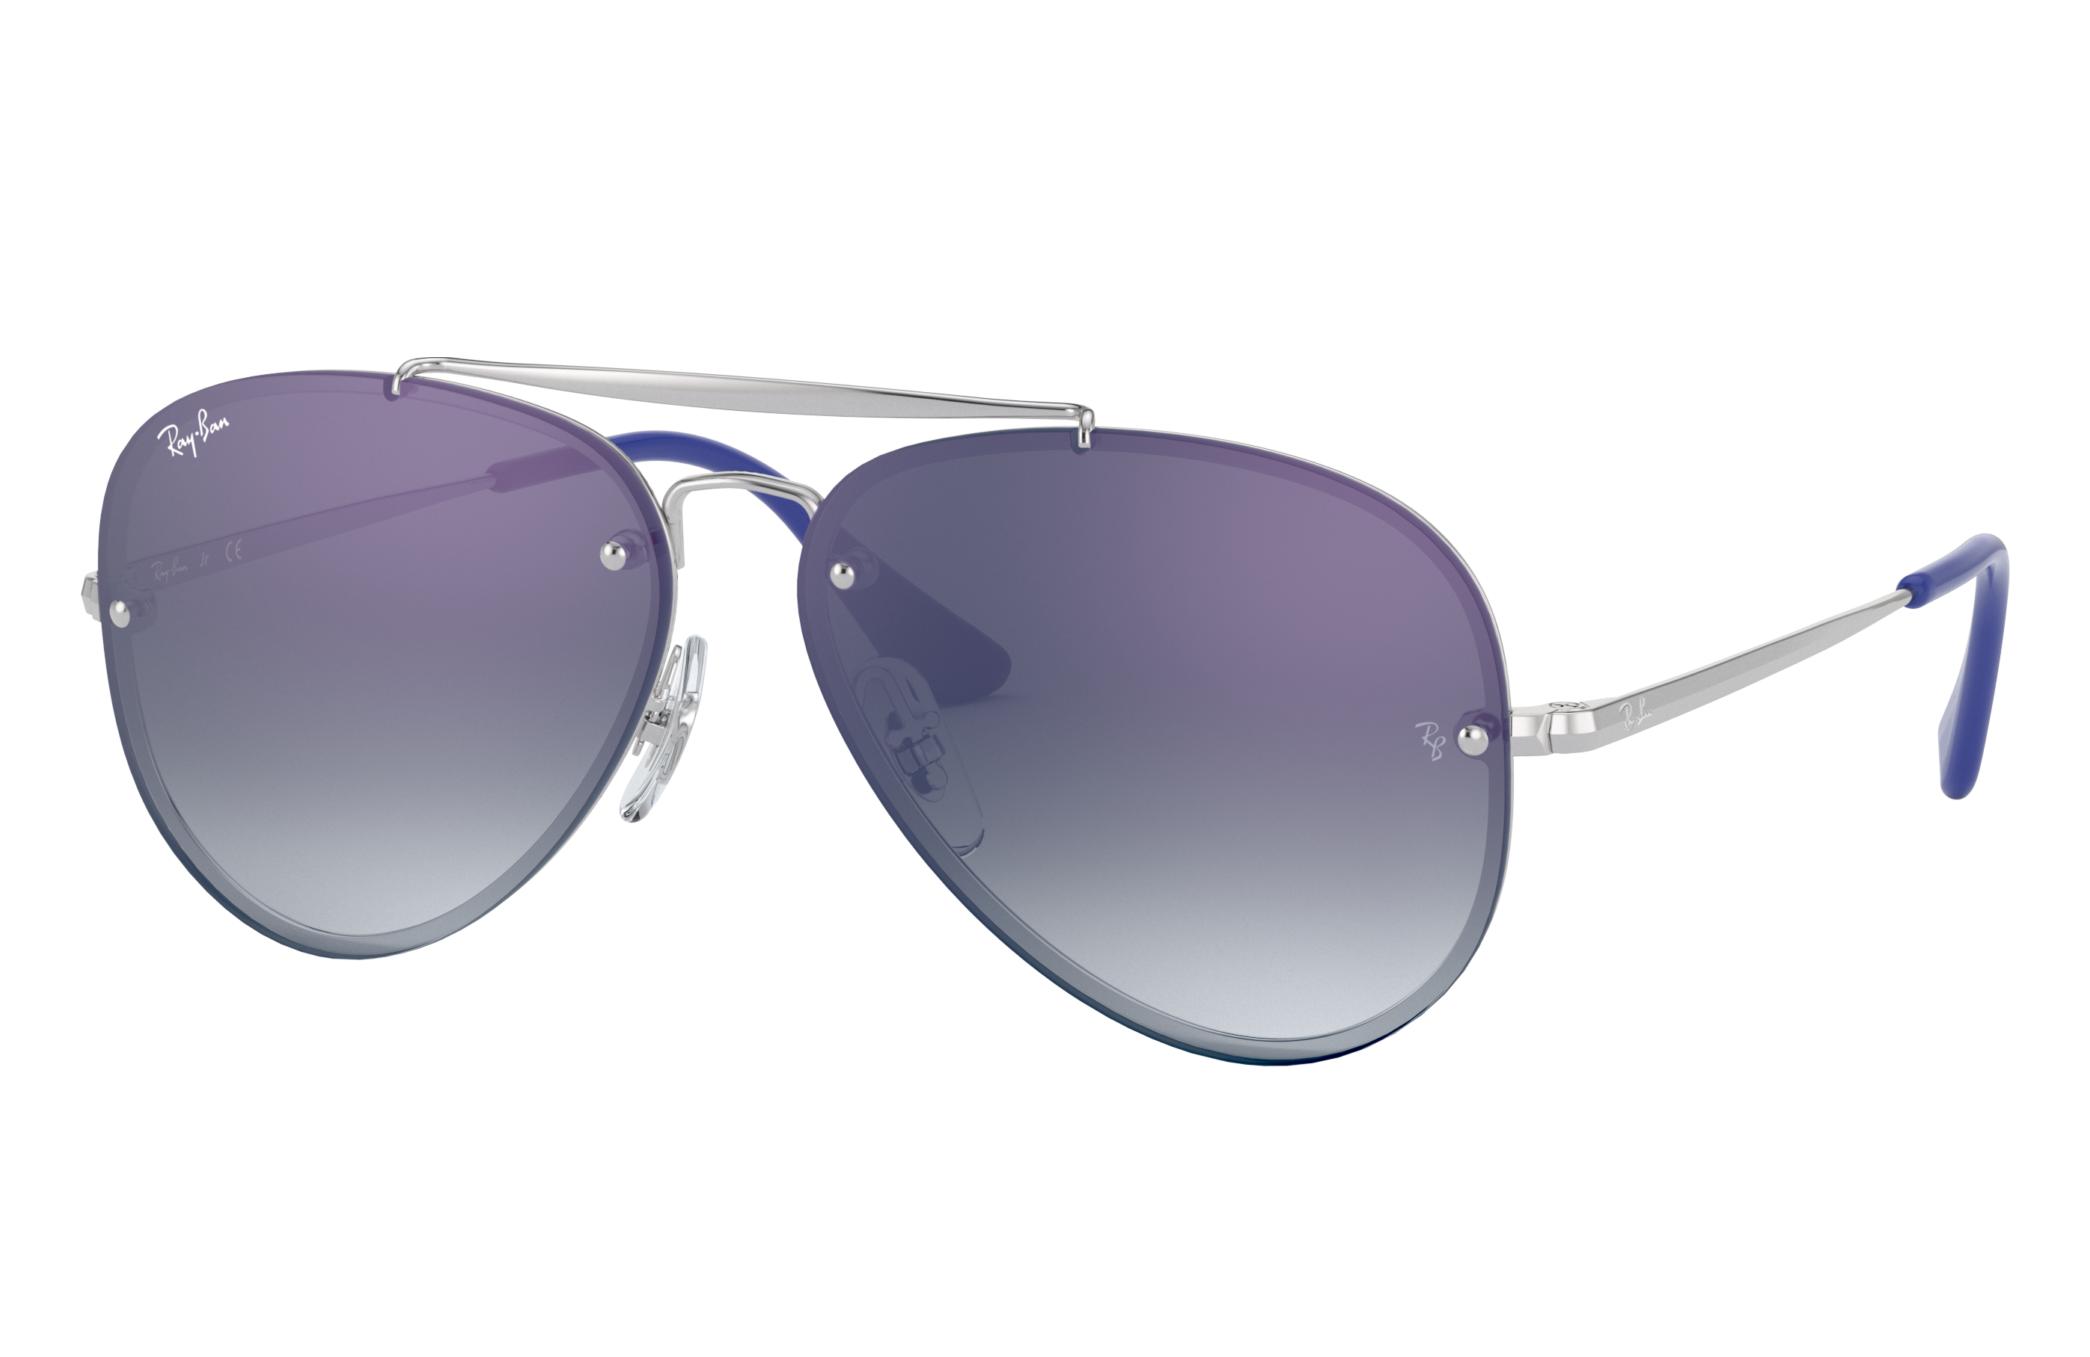 Ray-Ban Blaze Aviator Junior Silver, Blue Lenses - RJ9548SN